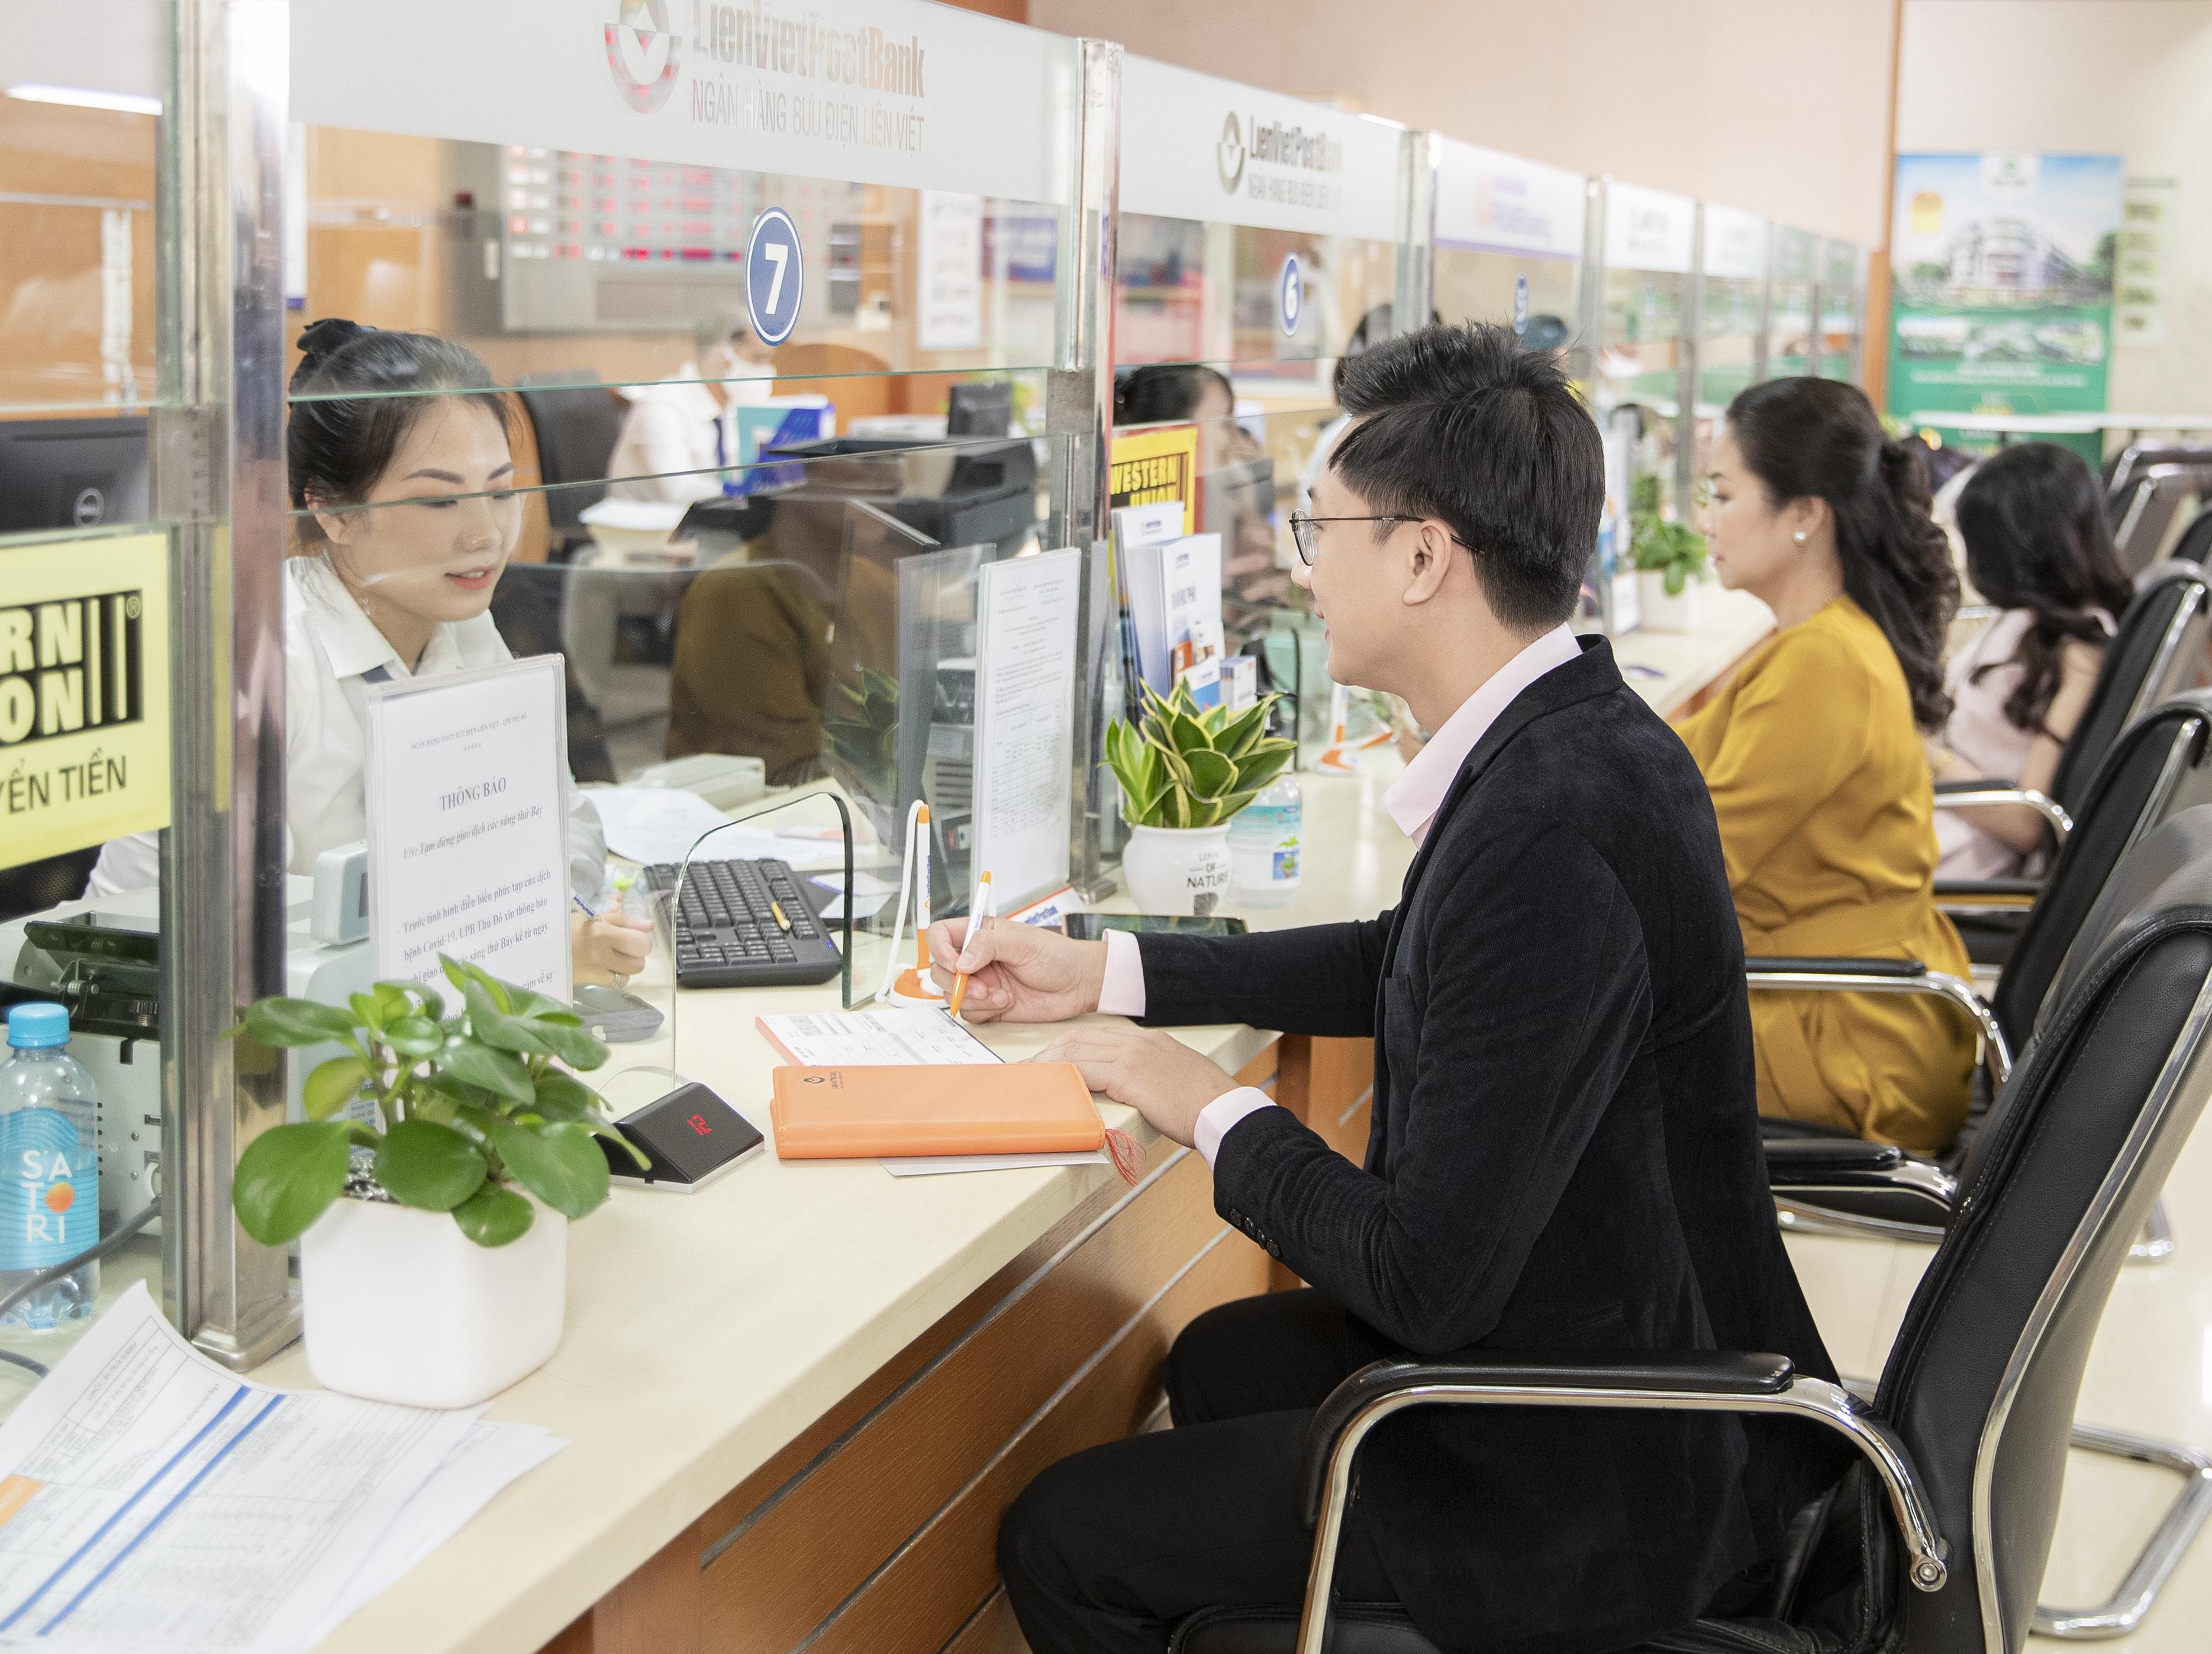 lienvietpostbank tra co tuc 10 bang co phieu tang von len gan 11 nghin ty dong